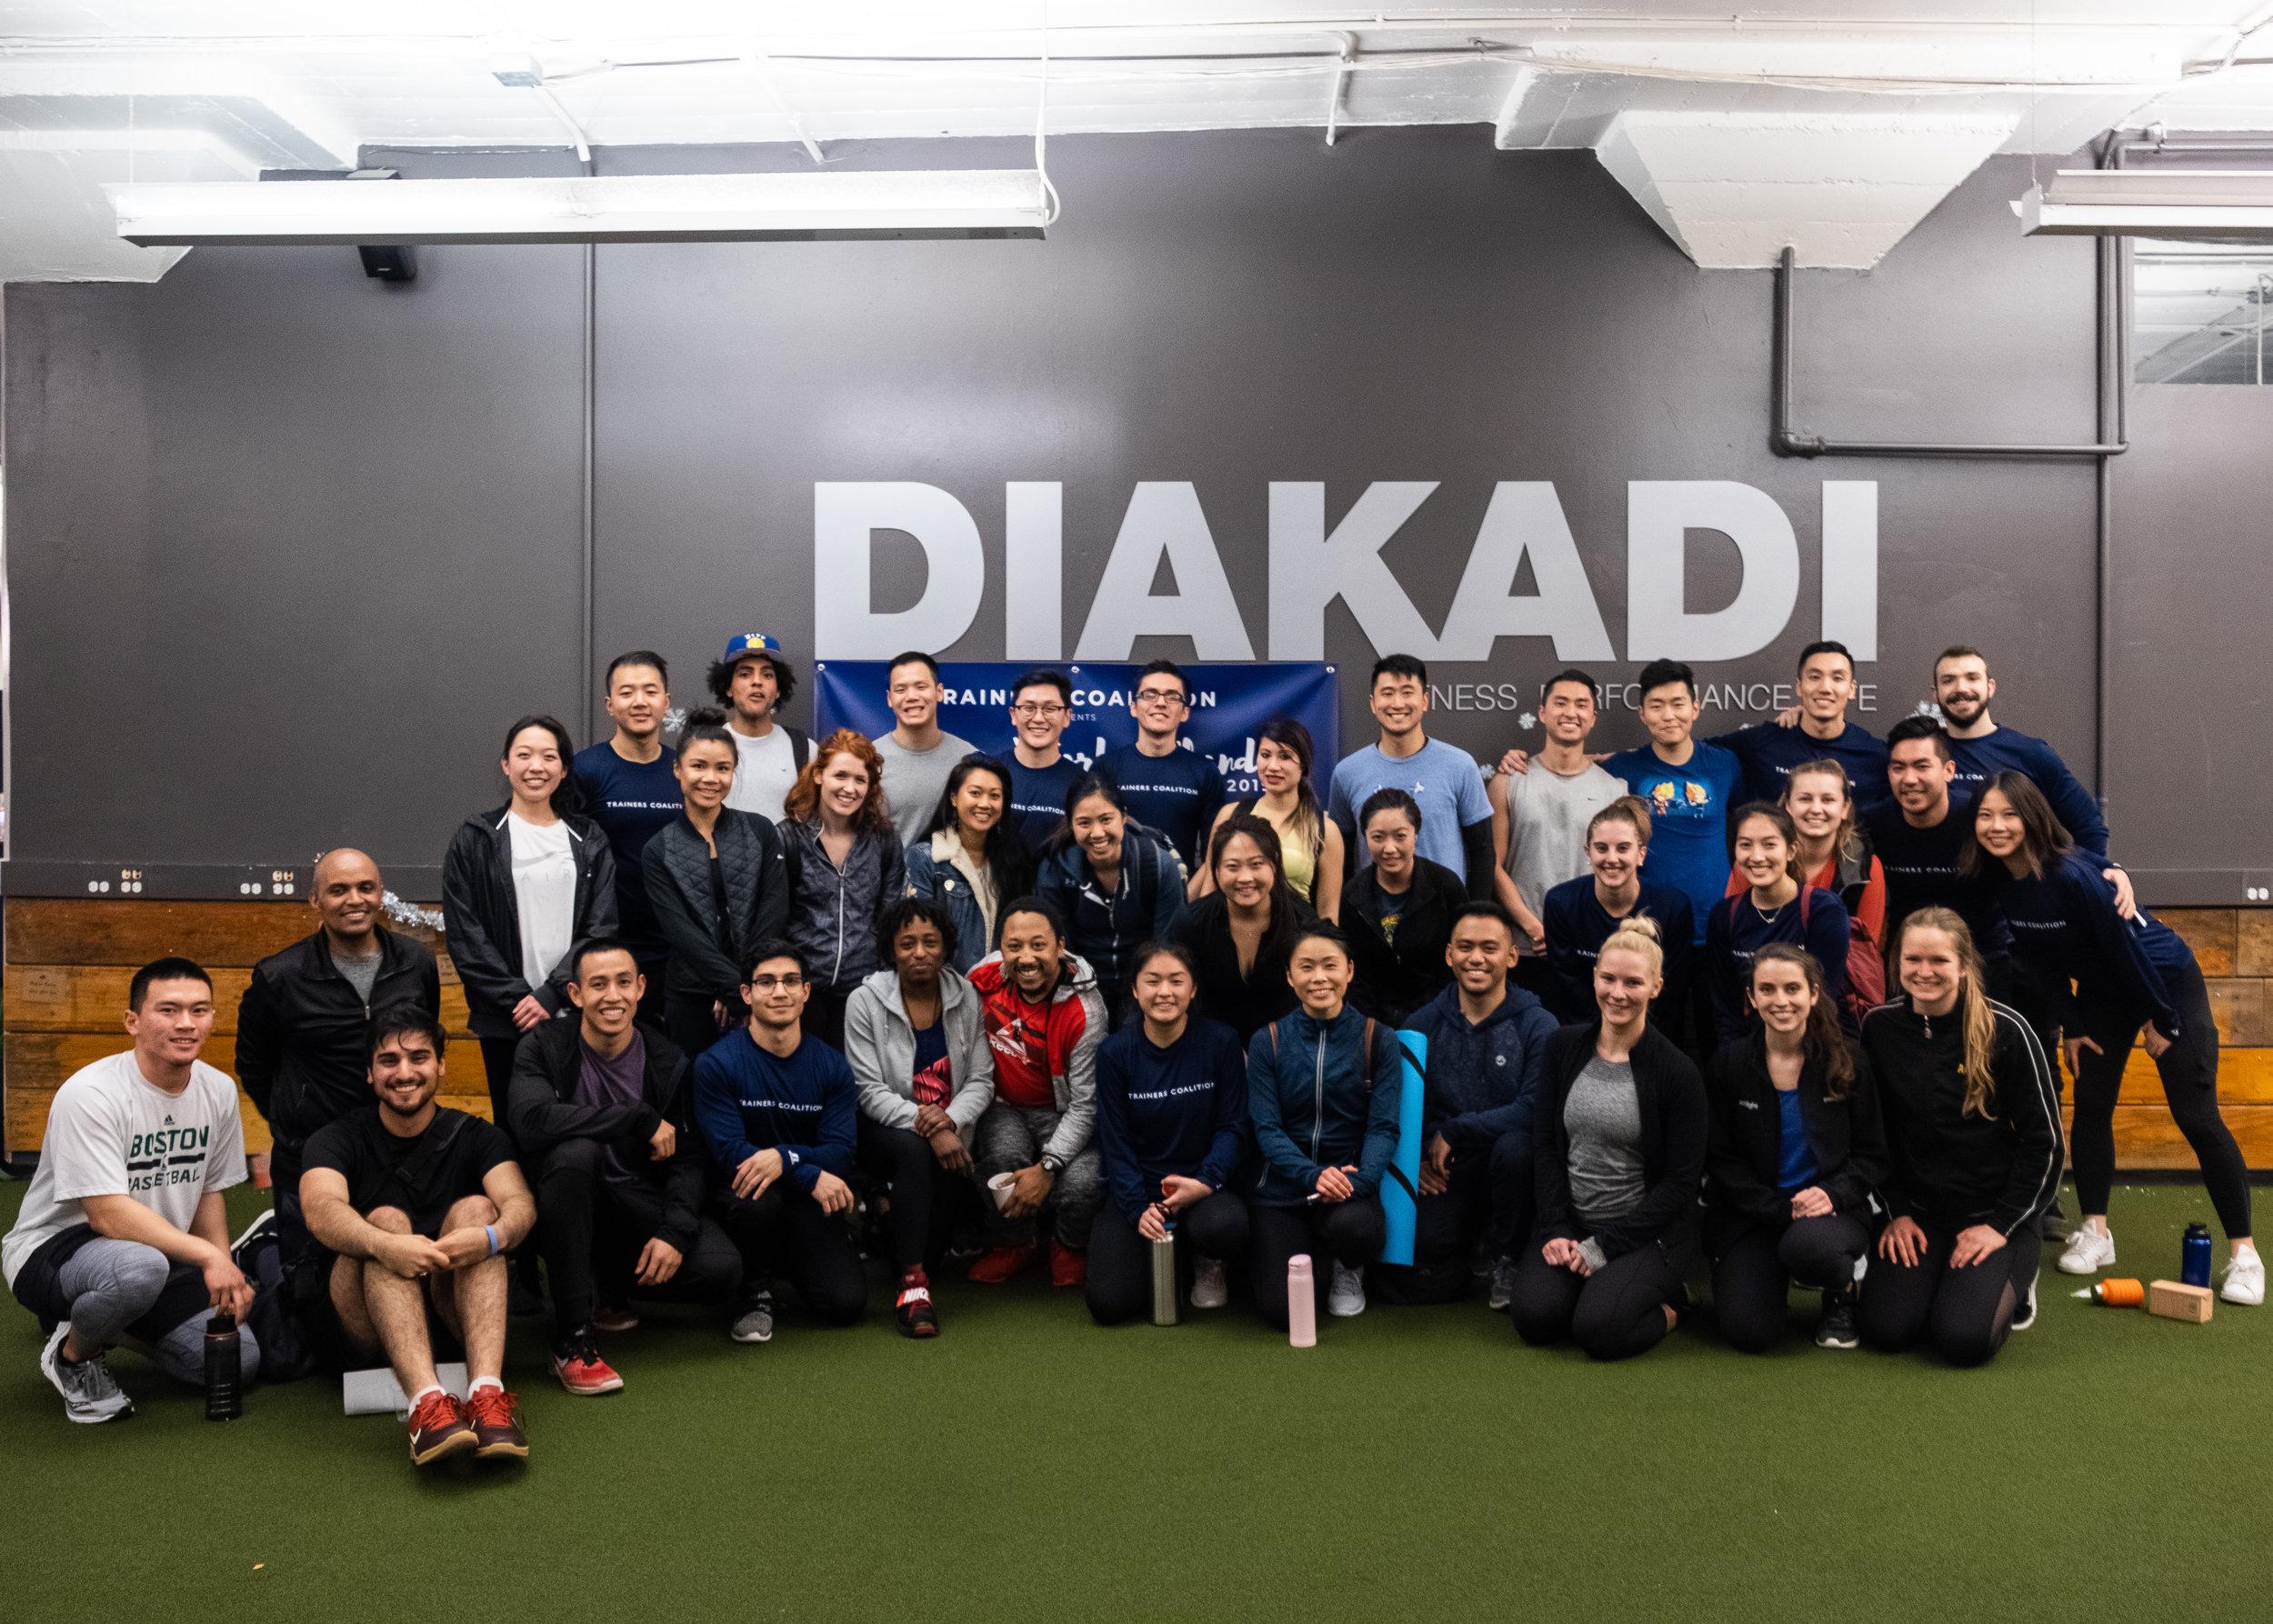 Trainers Coalition winter workoutland DIAKADI.jpg